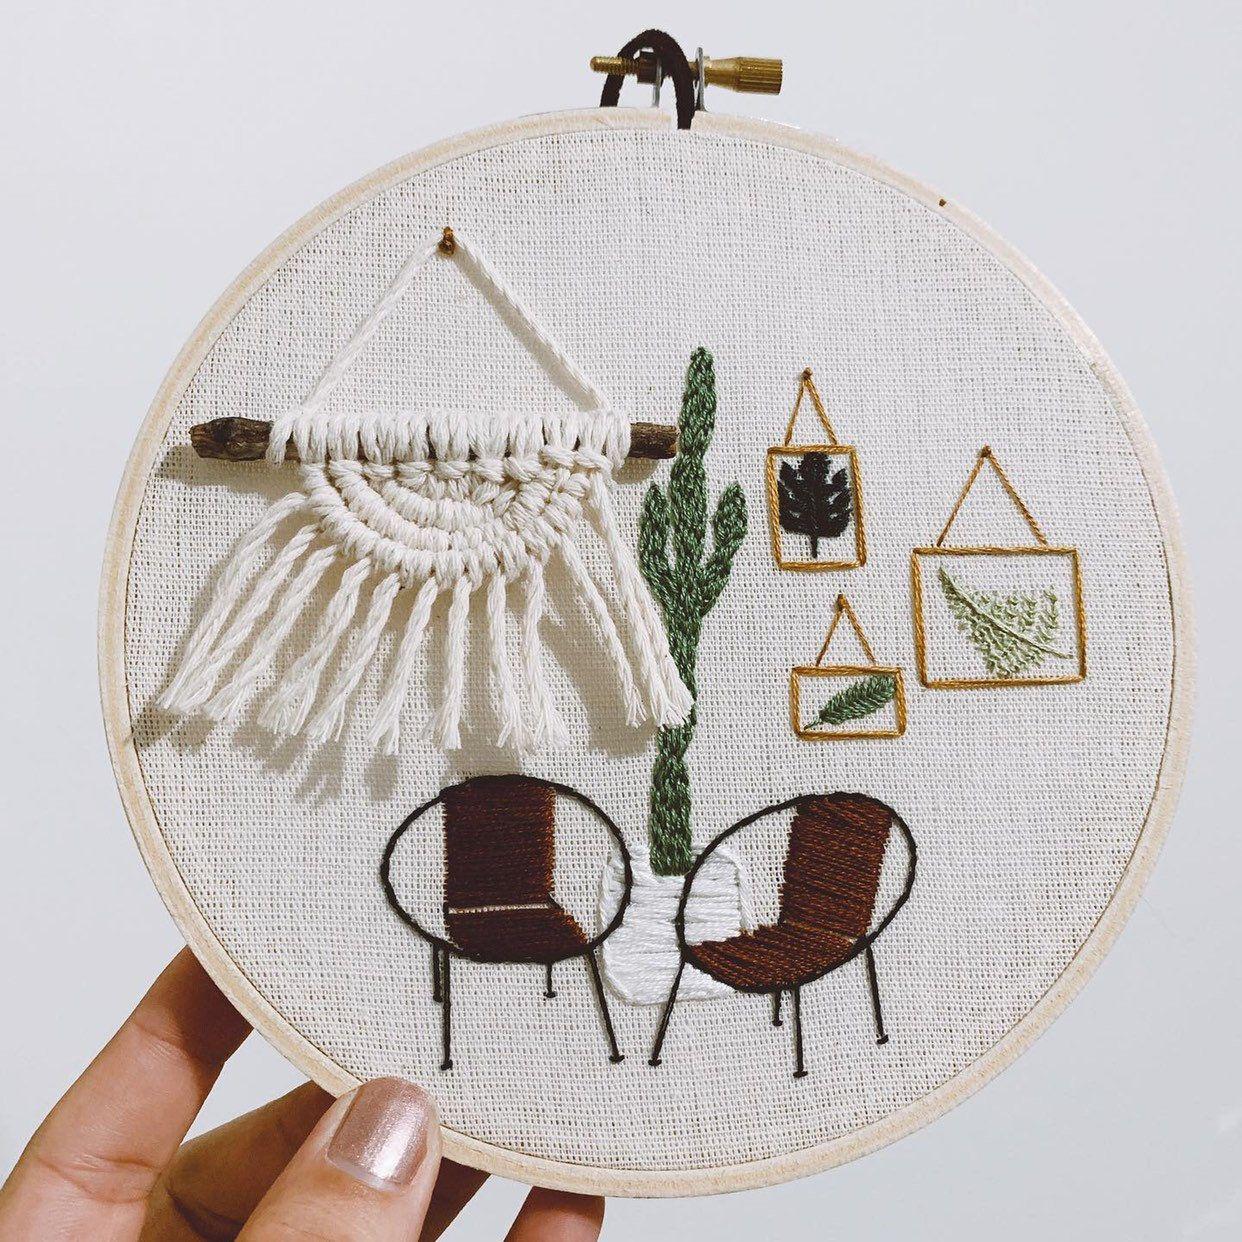 Cactus and Mini Macrame Hand Embroidered Hoop Wall Hanging Wall Decor Home Decor Handmade Gift Boho Decor